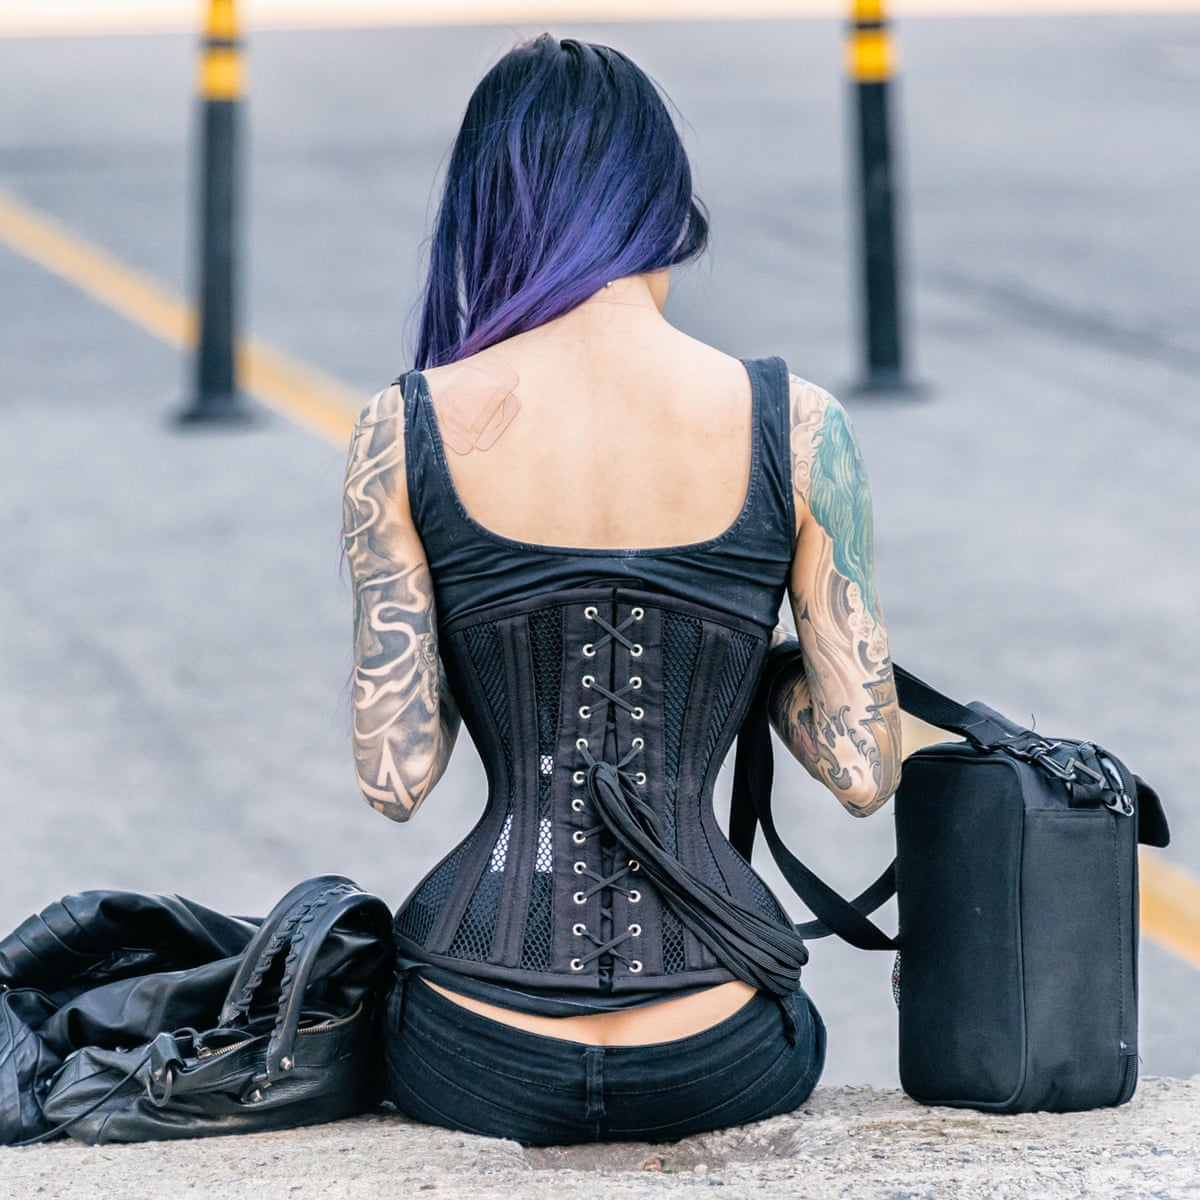 Fiction tight corset tightlacing